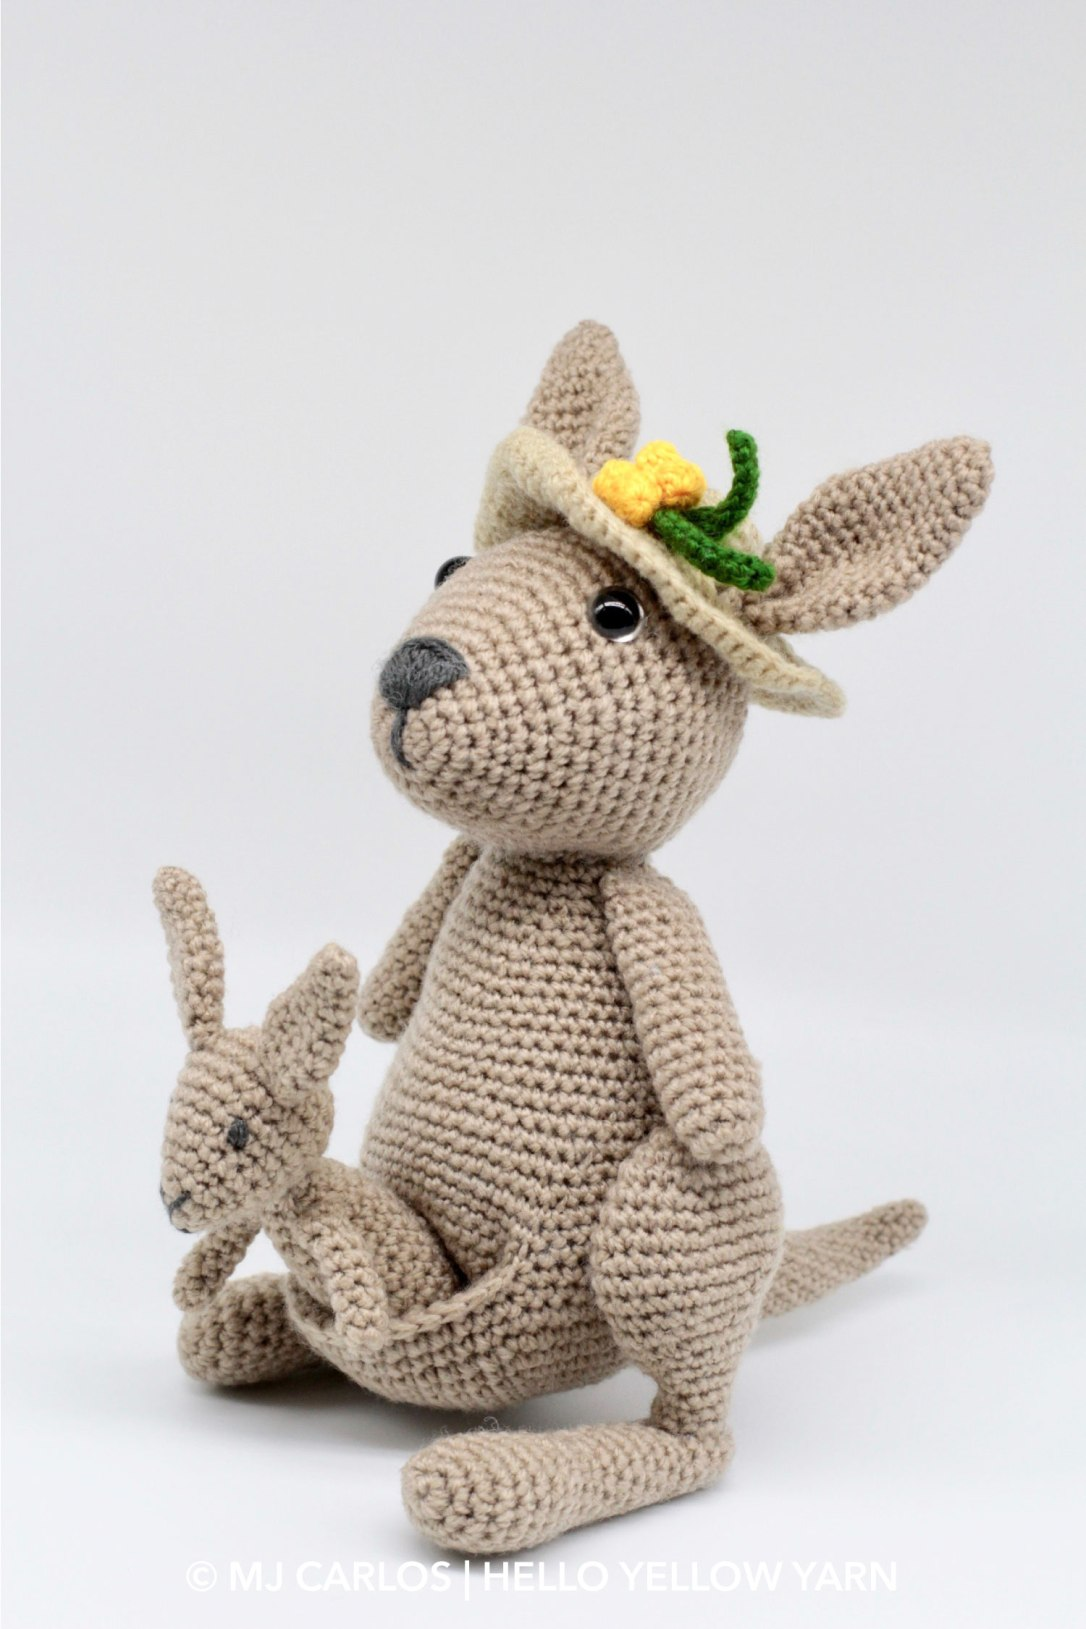 Kangaroo and Joey Amigurumi Pattern